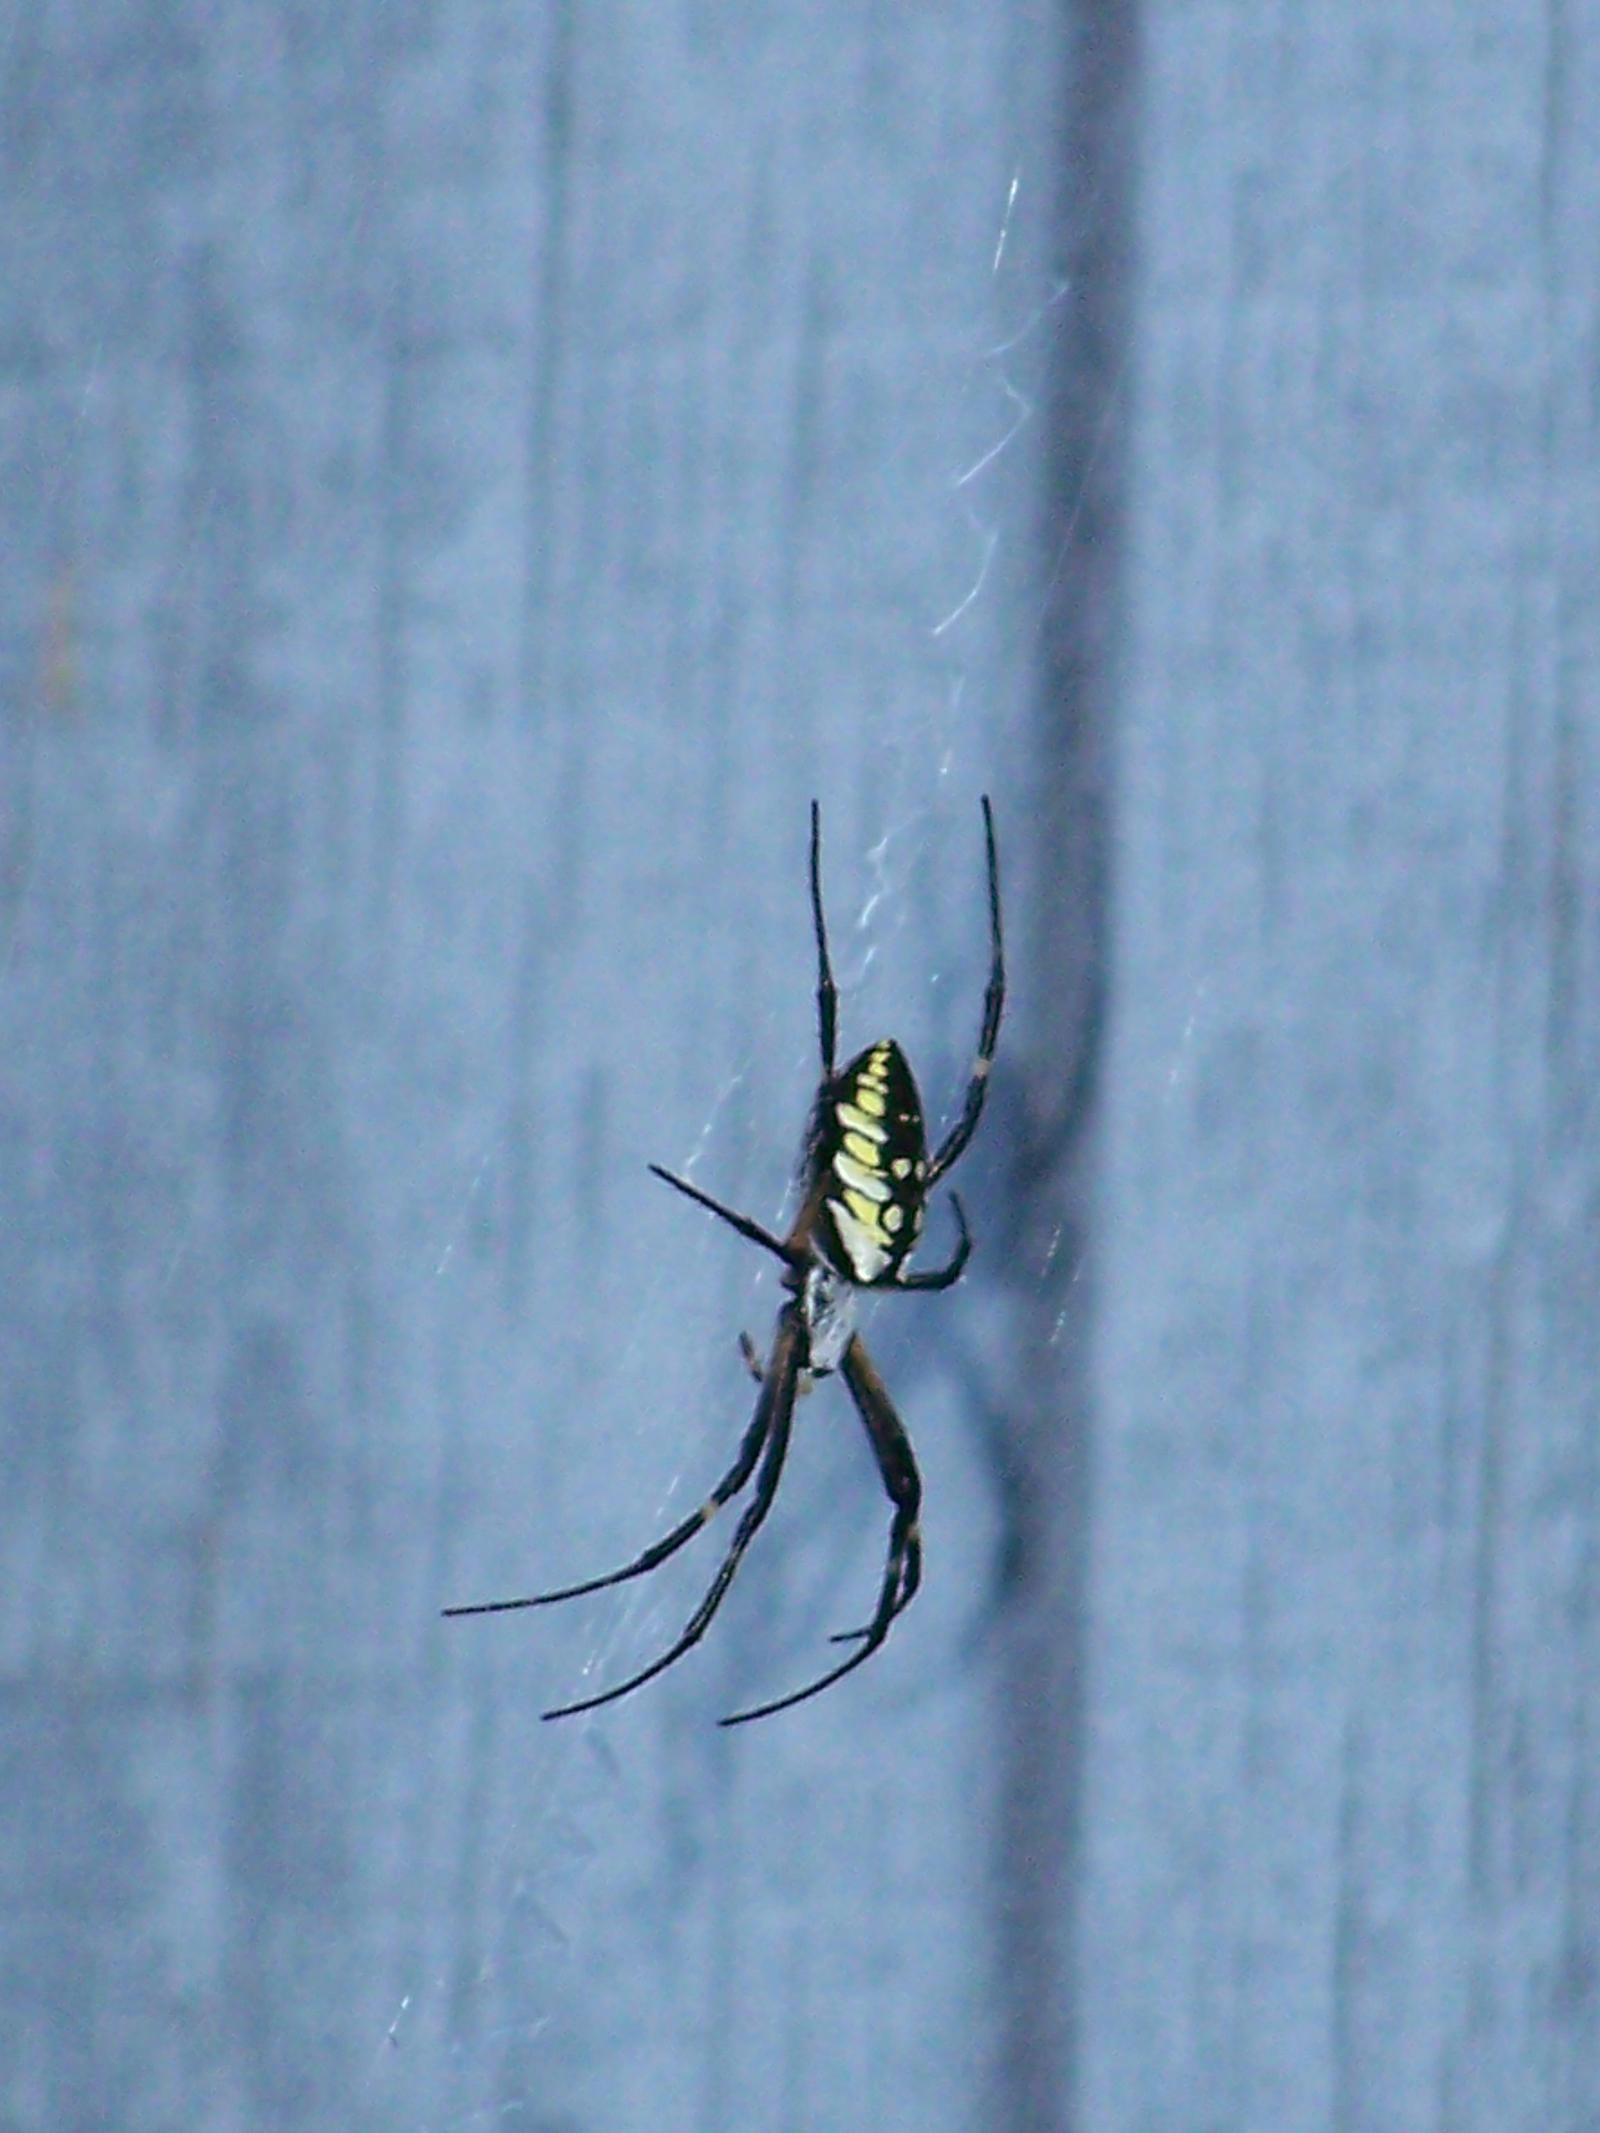 Icky Spider 2 by seiyastock